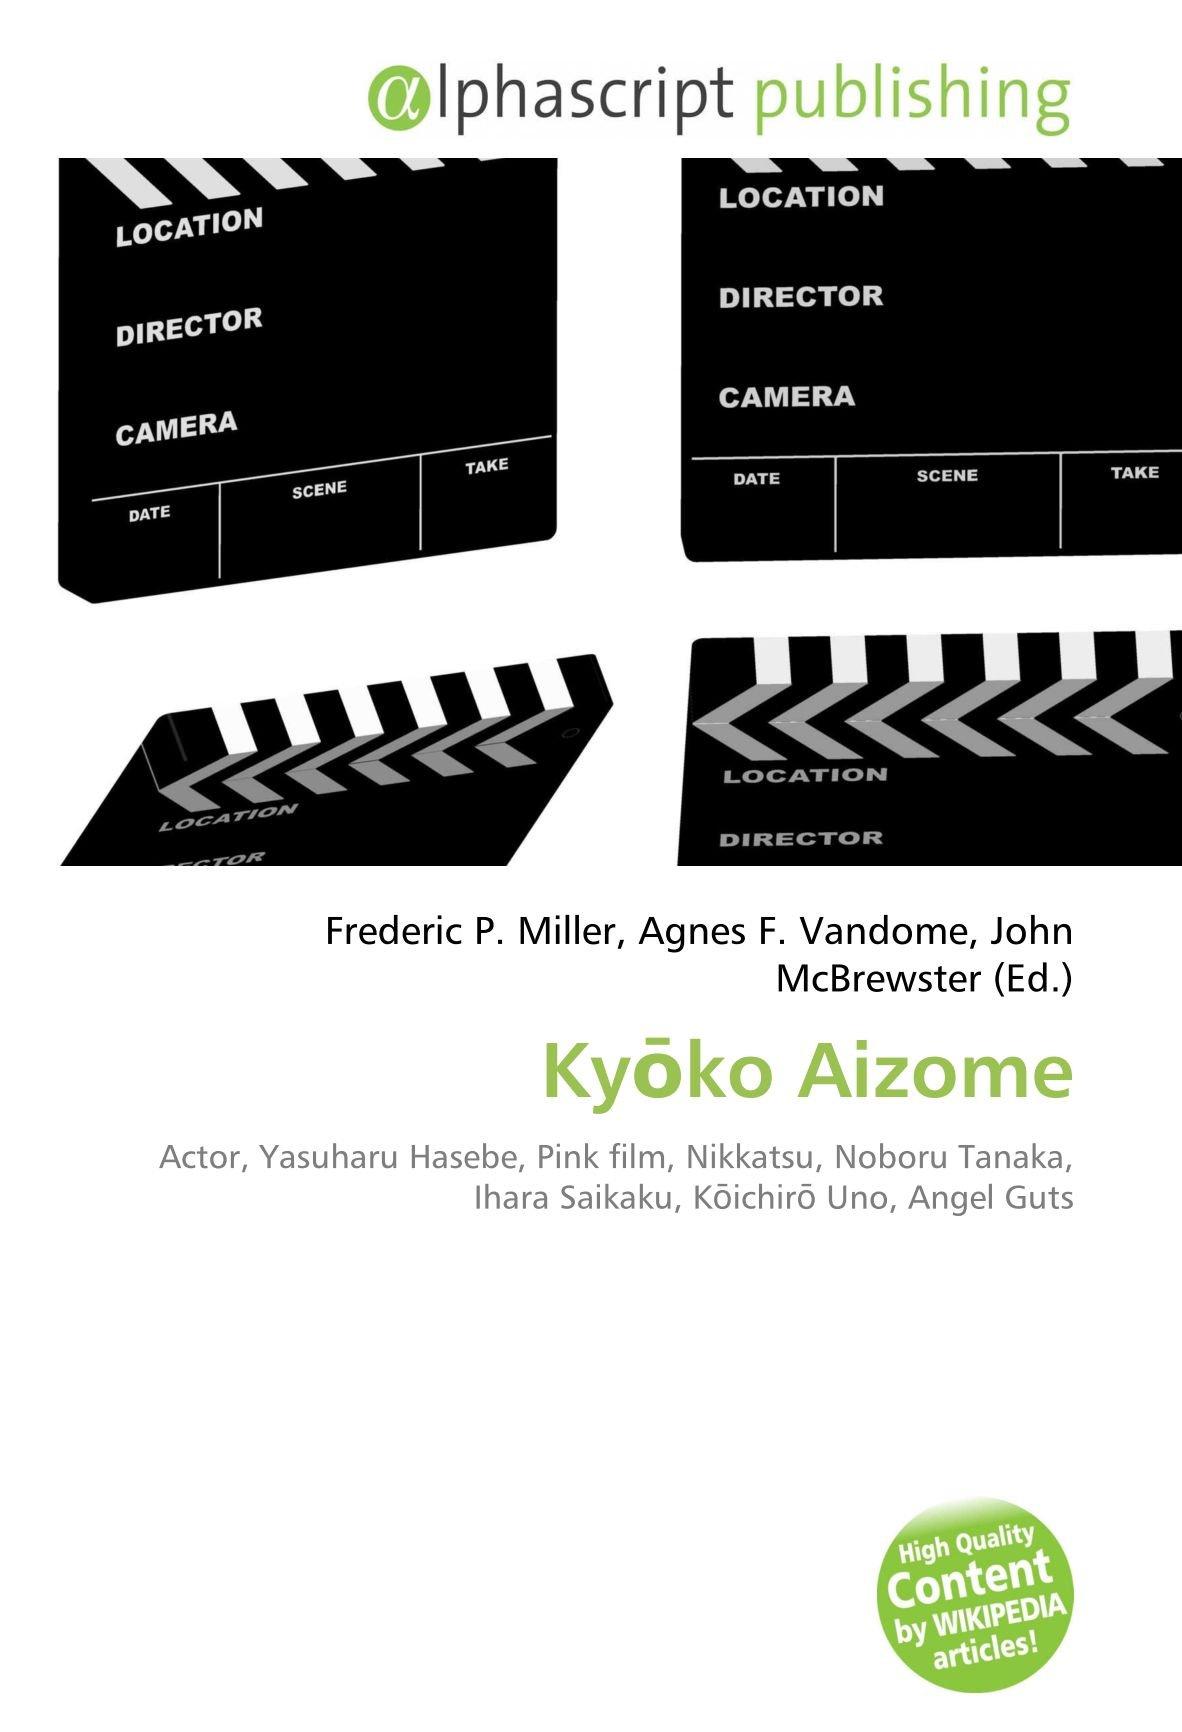 Kyoko Aizome Kyoko Aizome new photo